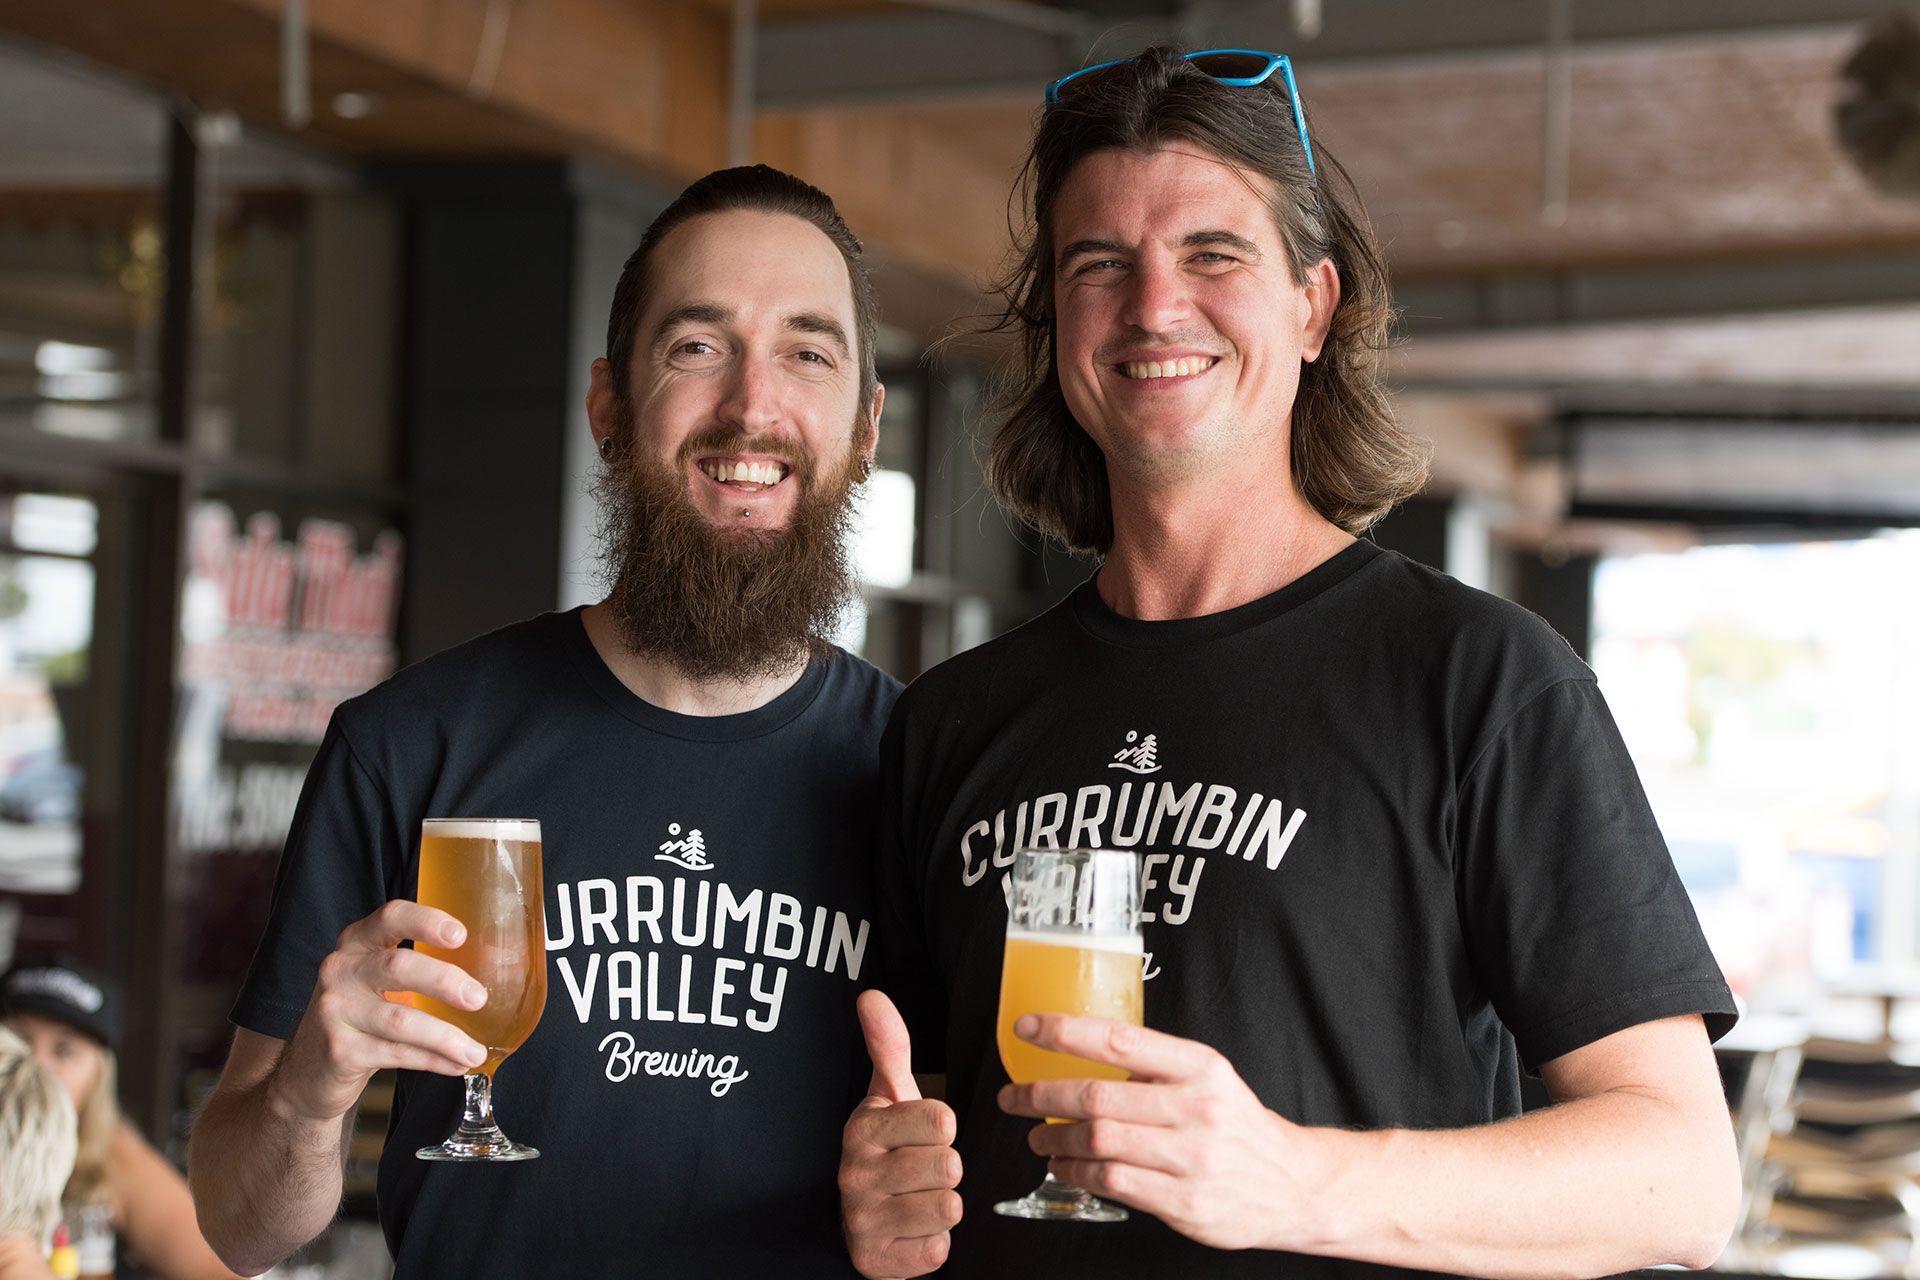 d18c1d06 Welcome to Currumbin Valley Brewing